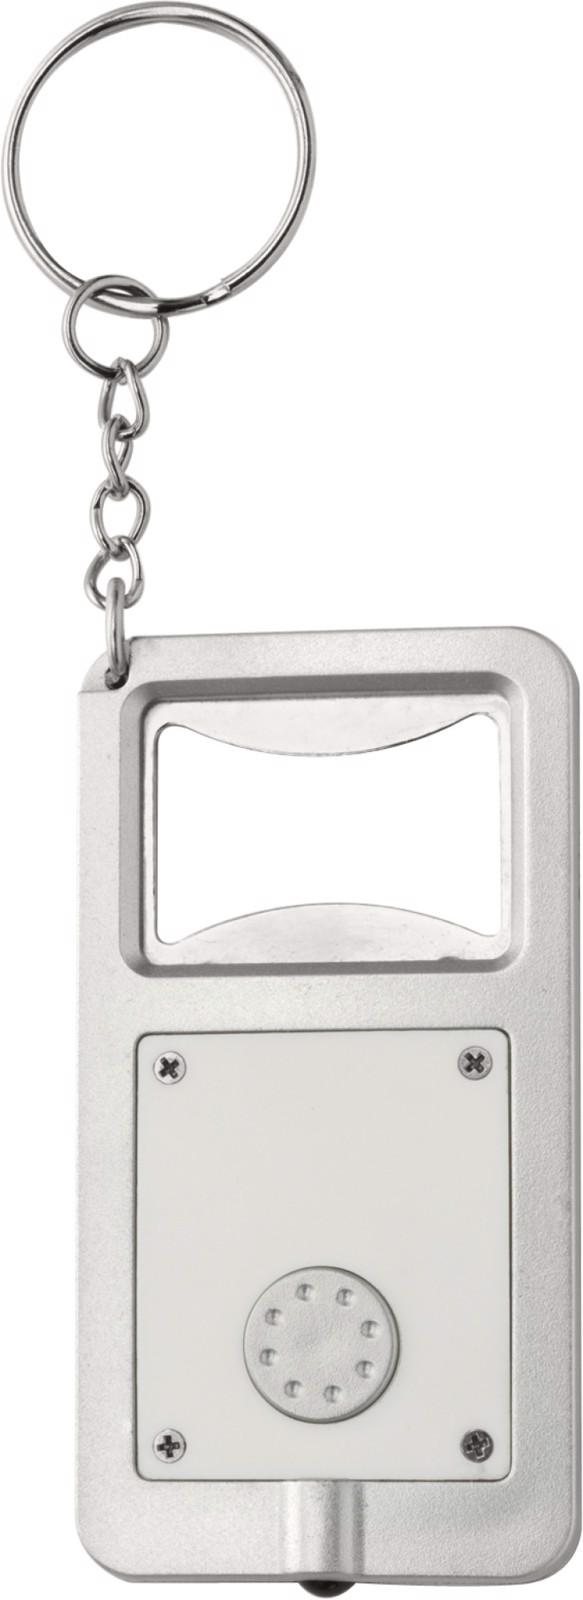 Plastic key holder with LED - White